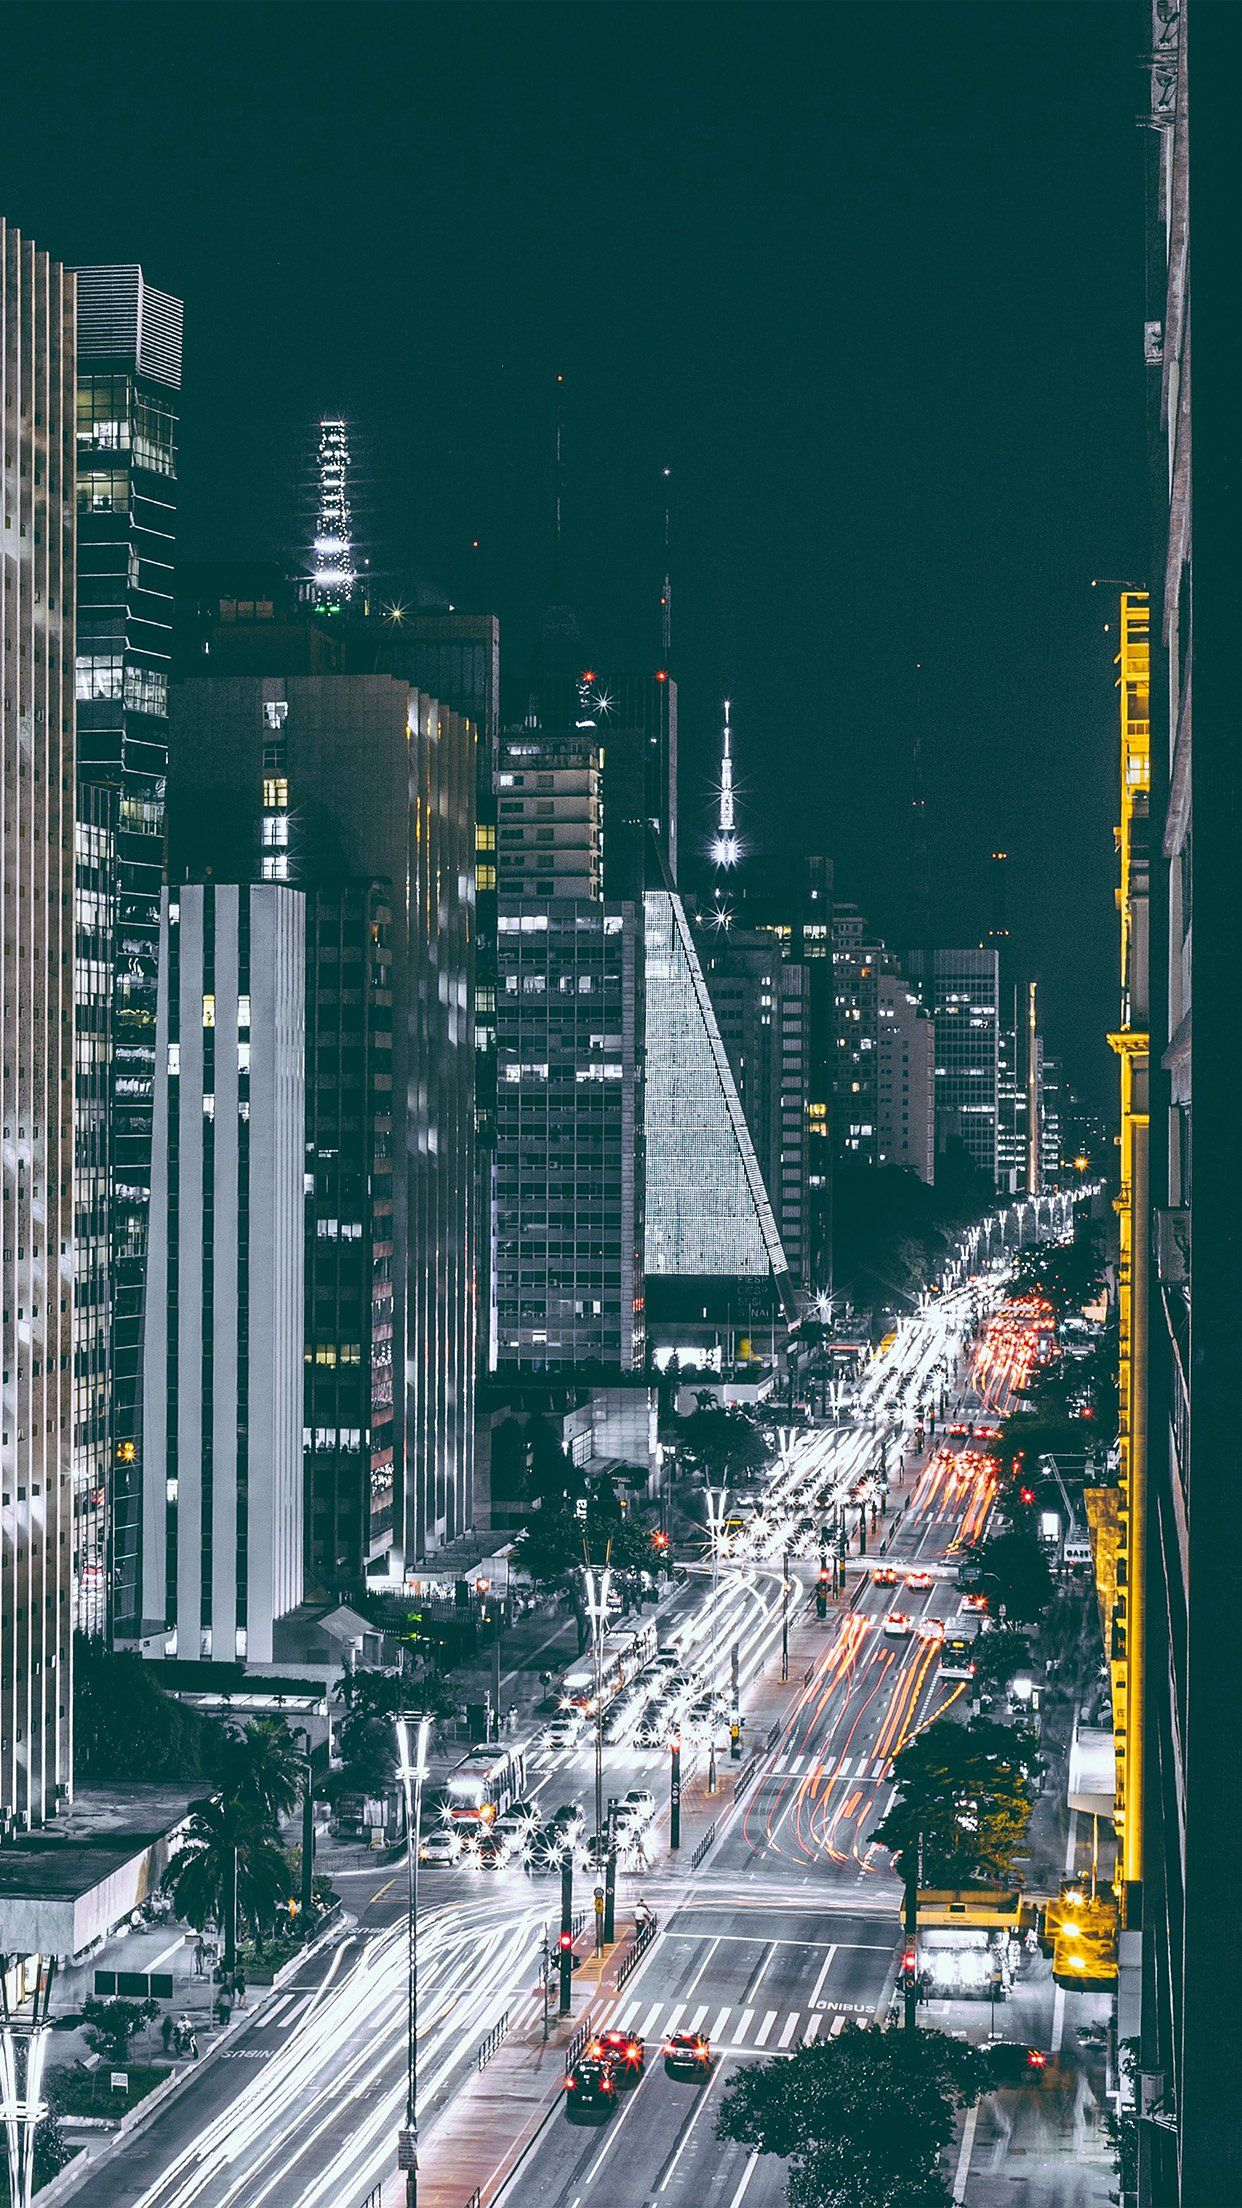 cool city-night-view-urban-street iphone6-plus-wallpaper | Mobile Wallpaper | Iphone 6 wallpaper ...